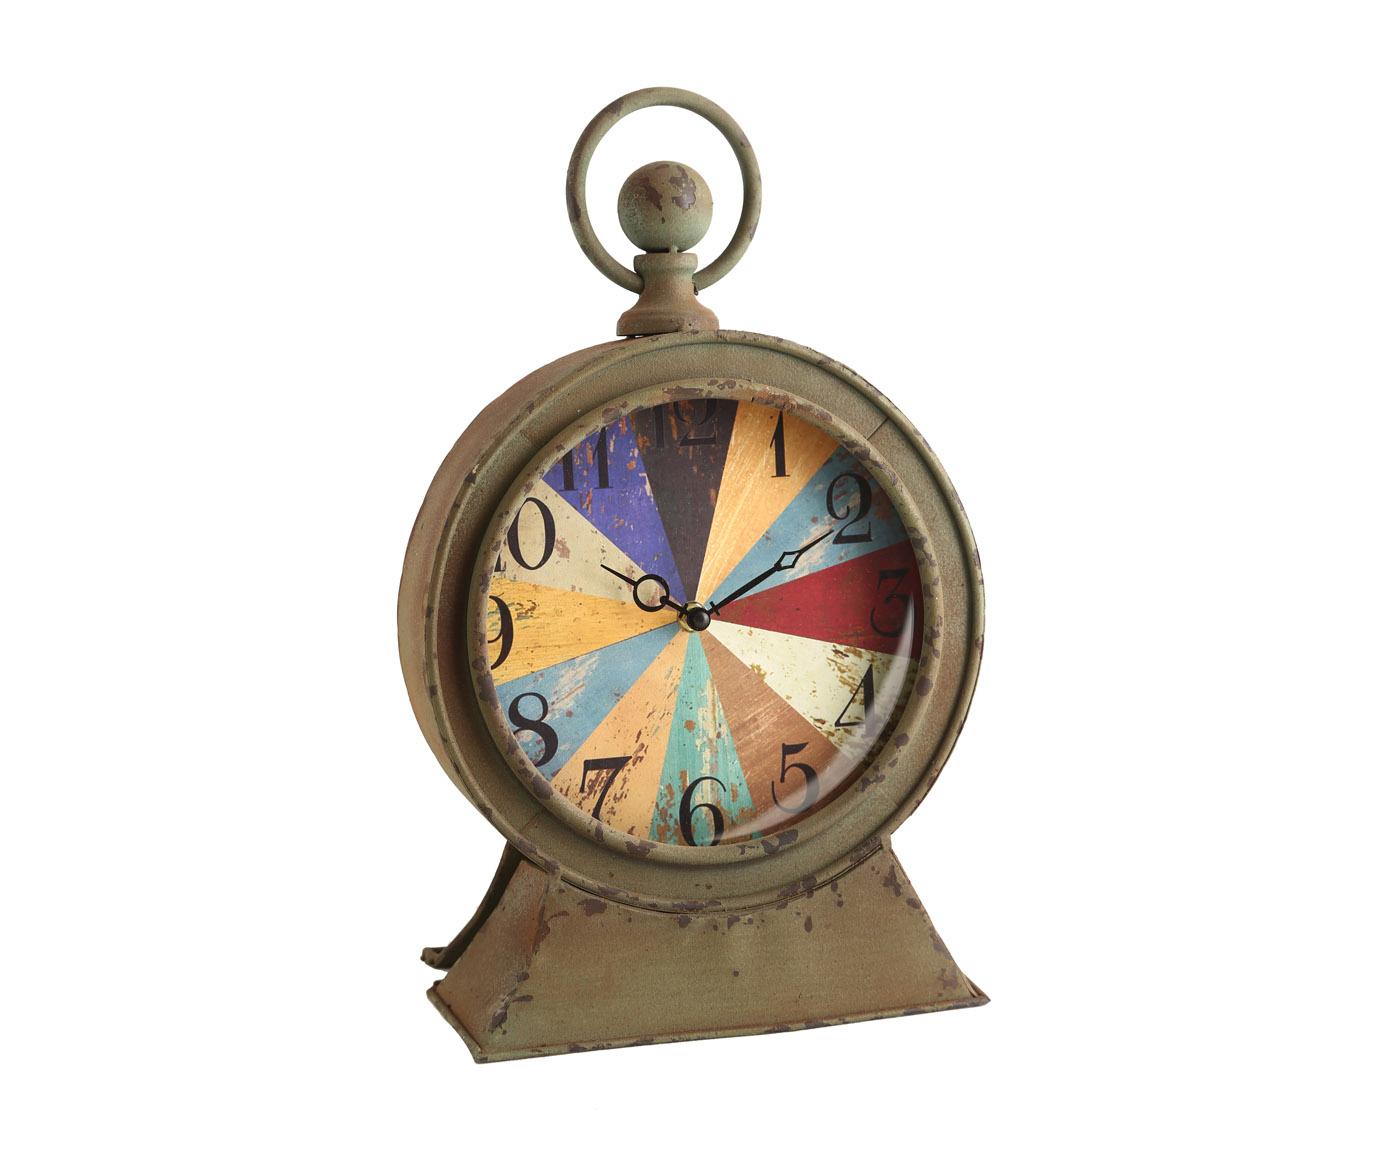 Часы настольныеНастольные часы<br>Кварцевый механизм, работают от батарейки типа АА<br><br>Material: Металл<br>Width см: 24<br>Depth см: 13<br>Height см: 40